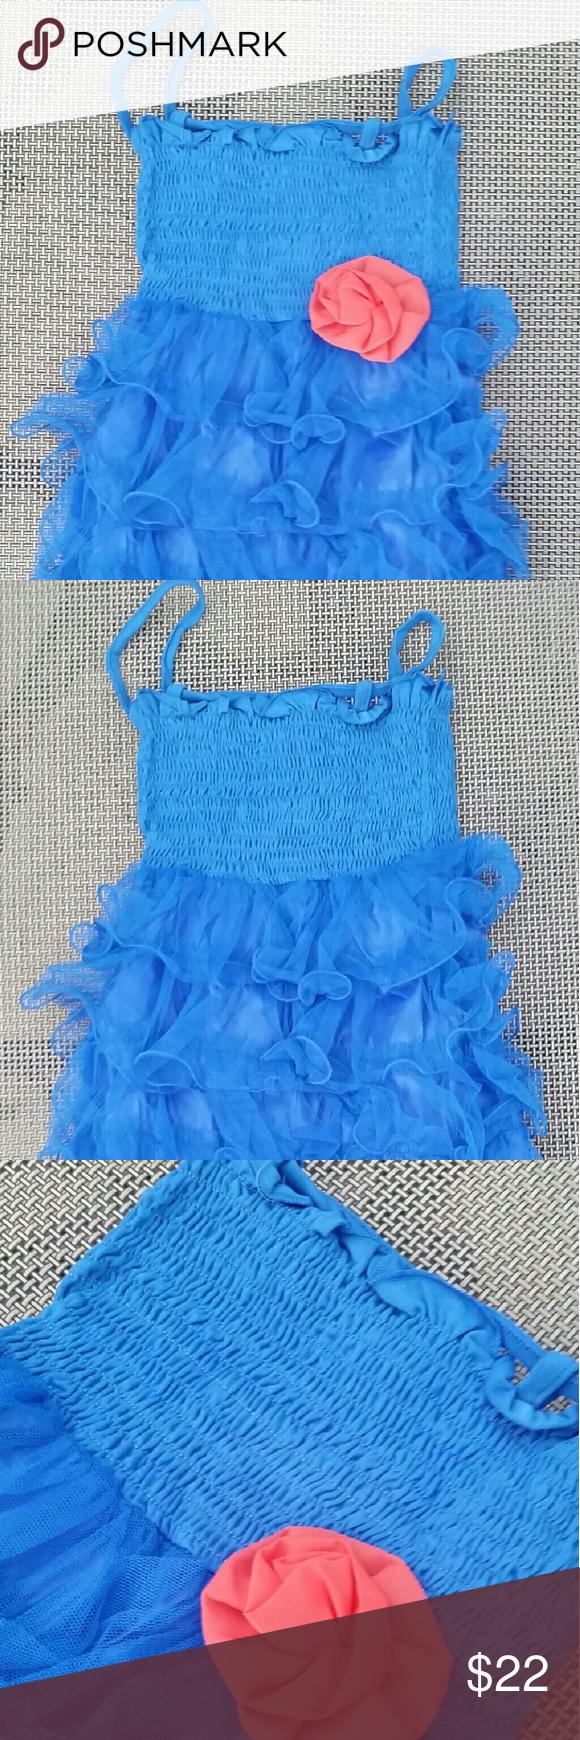 Lowest price blue girlus dress orange peach flower nwt blue tulle